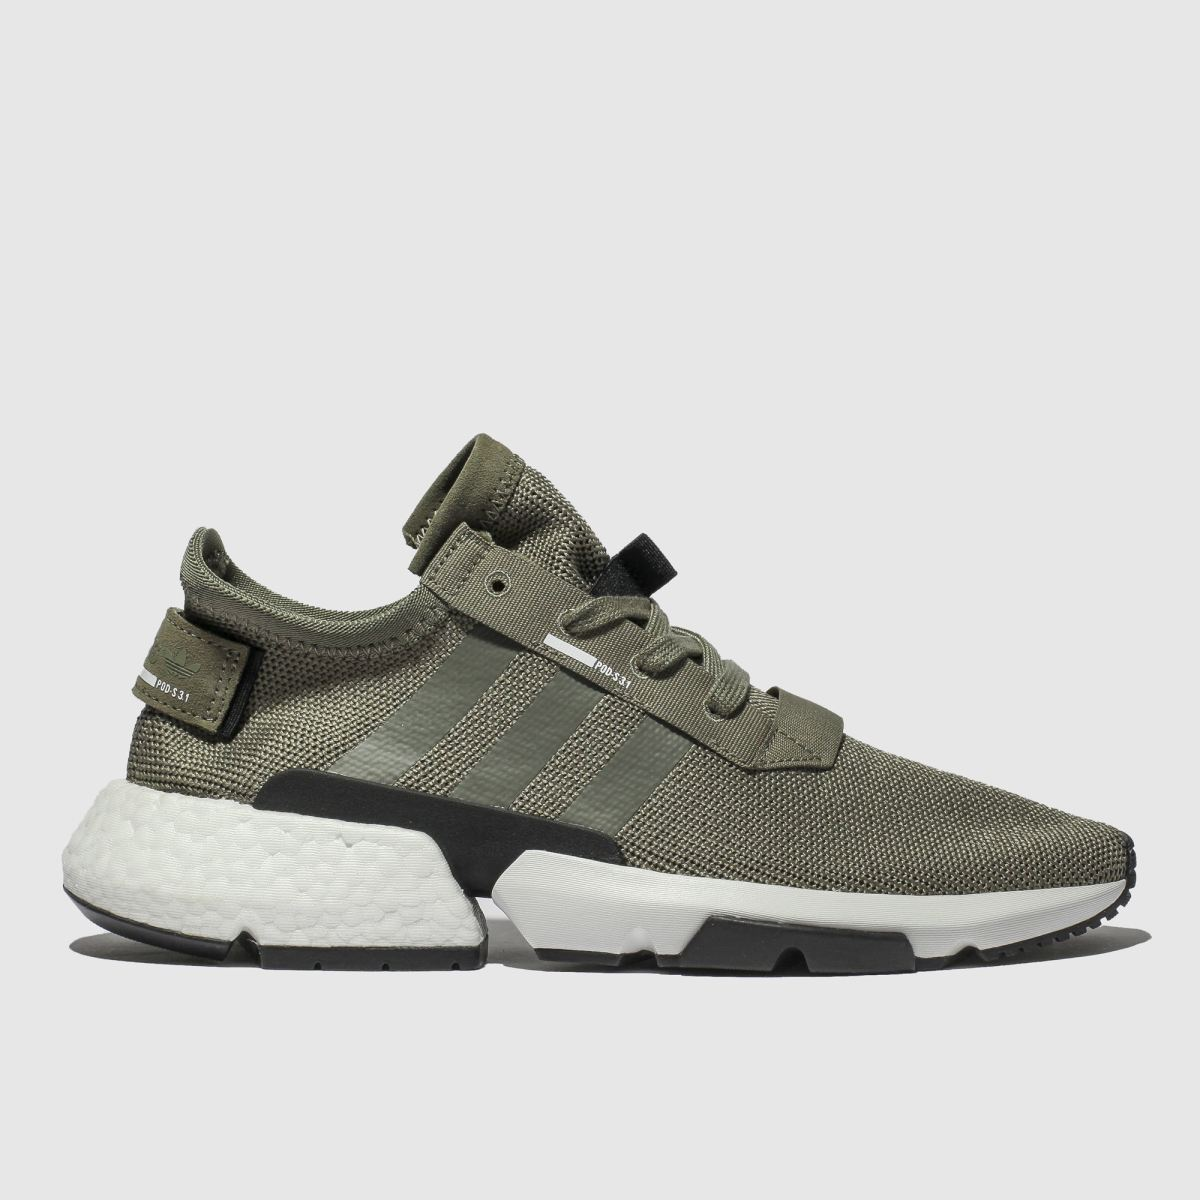 adidas POD-S3.1 Shoes | B37369 | FOOTY.COM